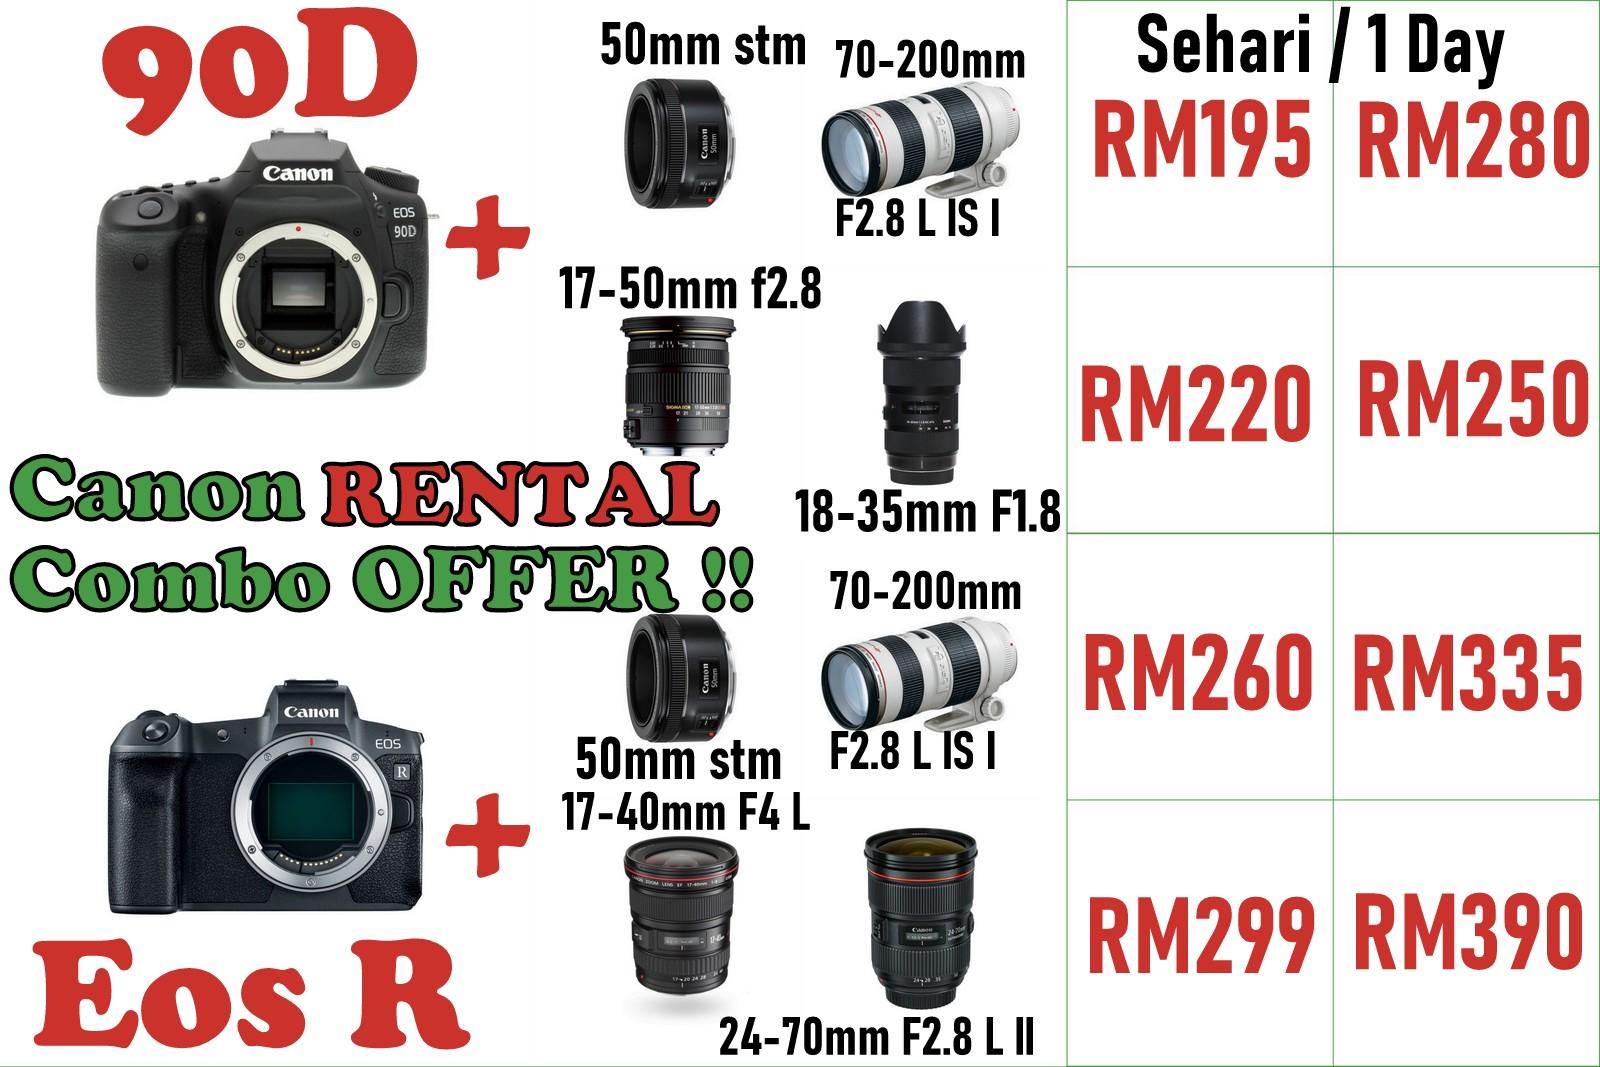 Latest Camera Offer!